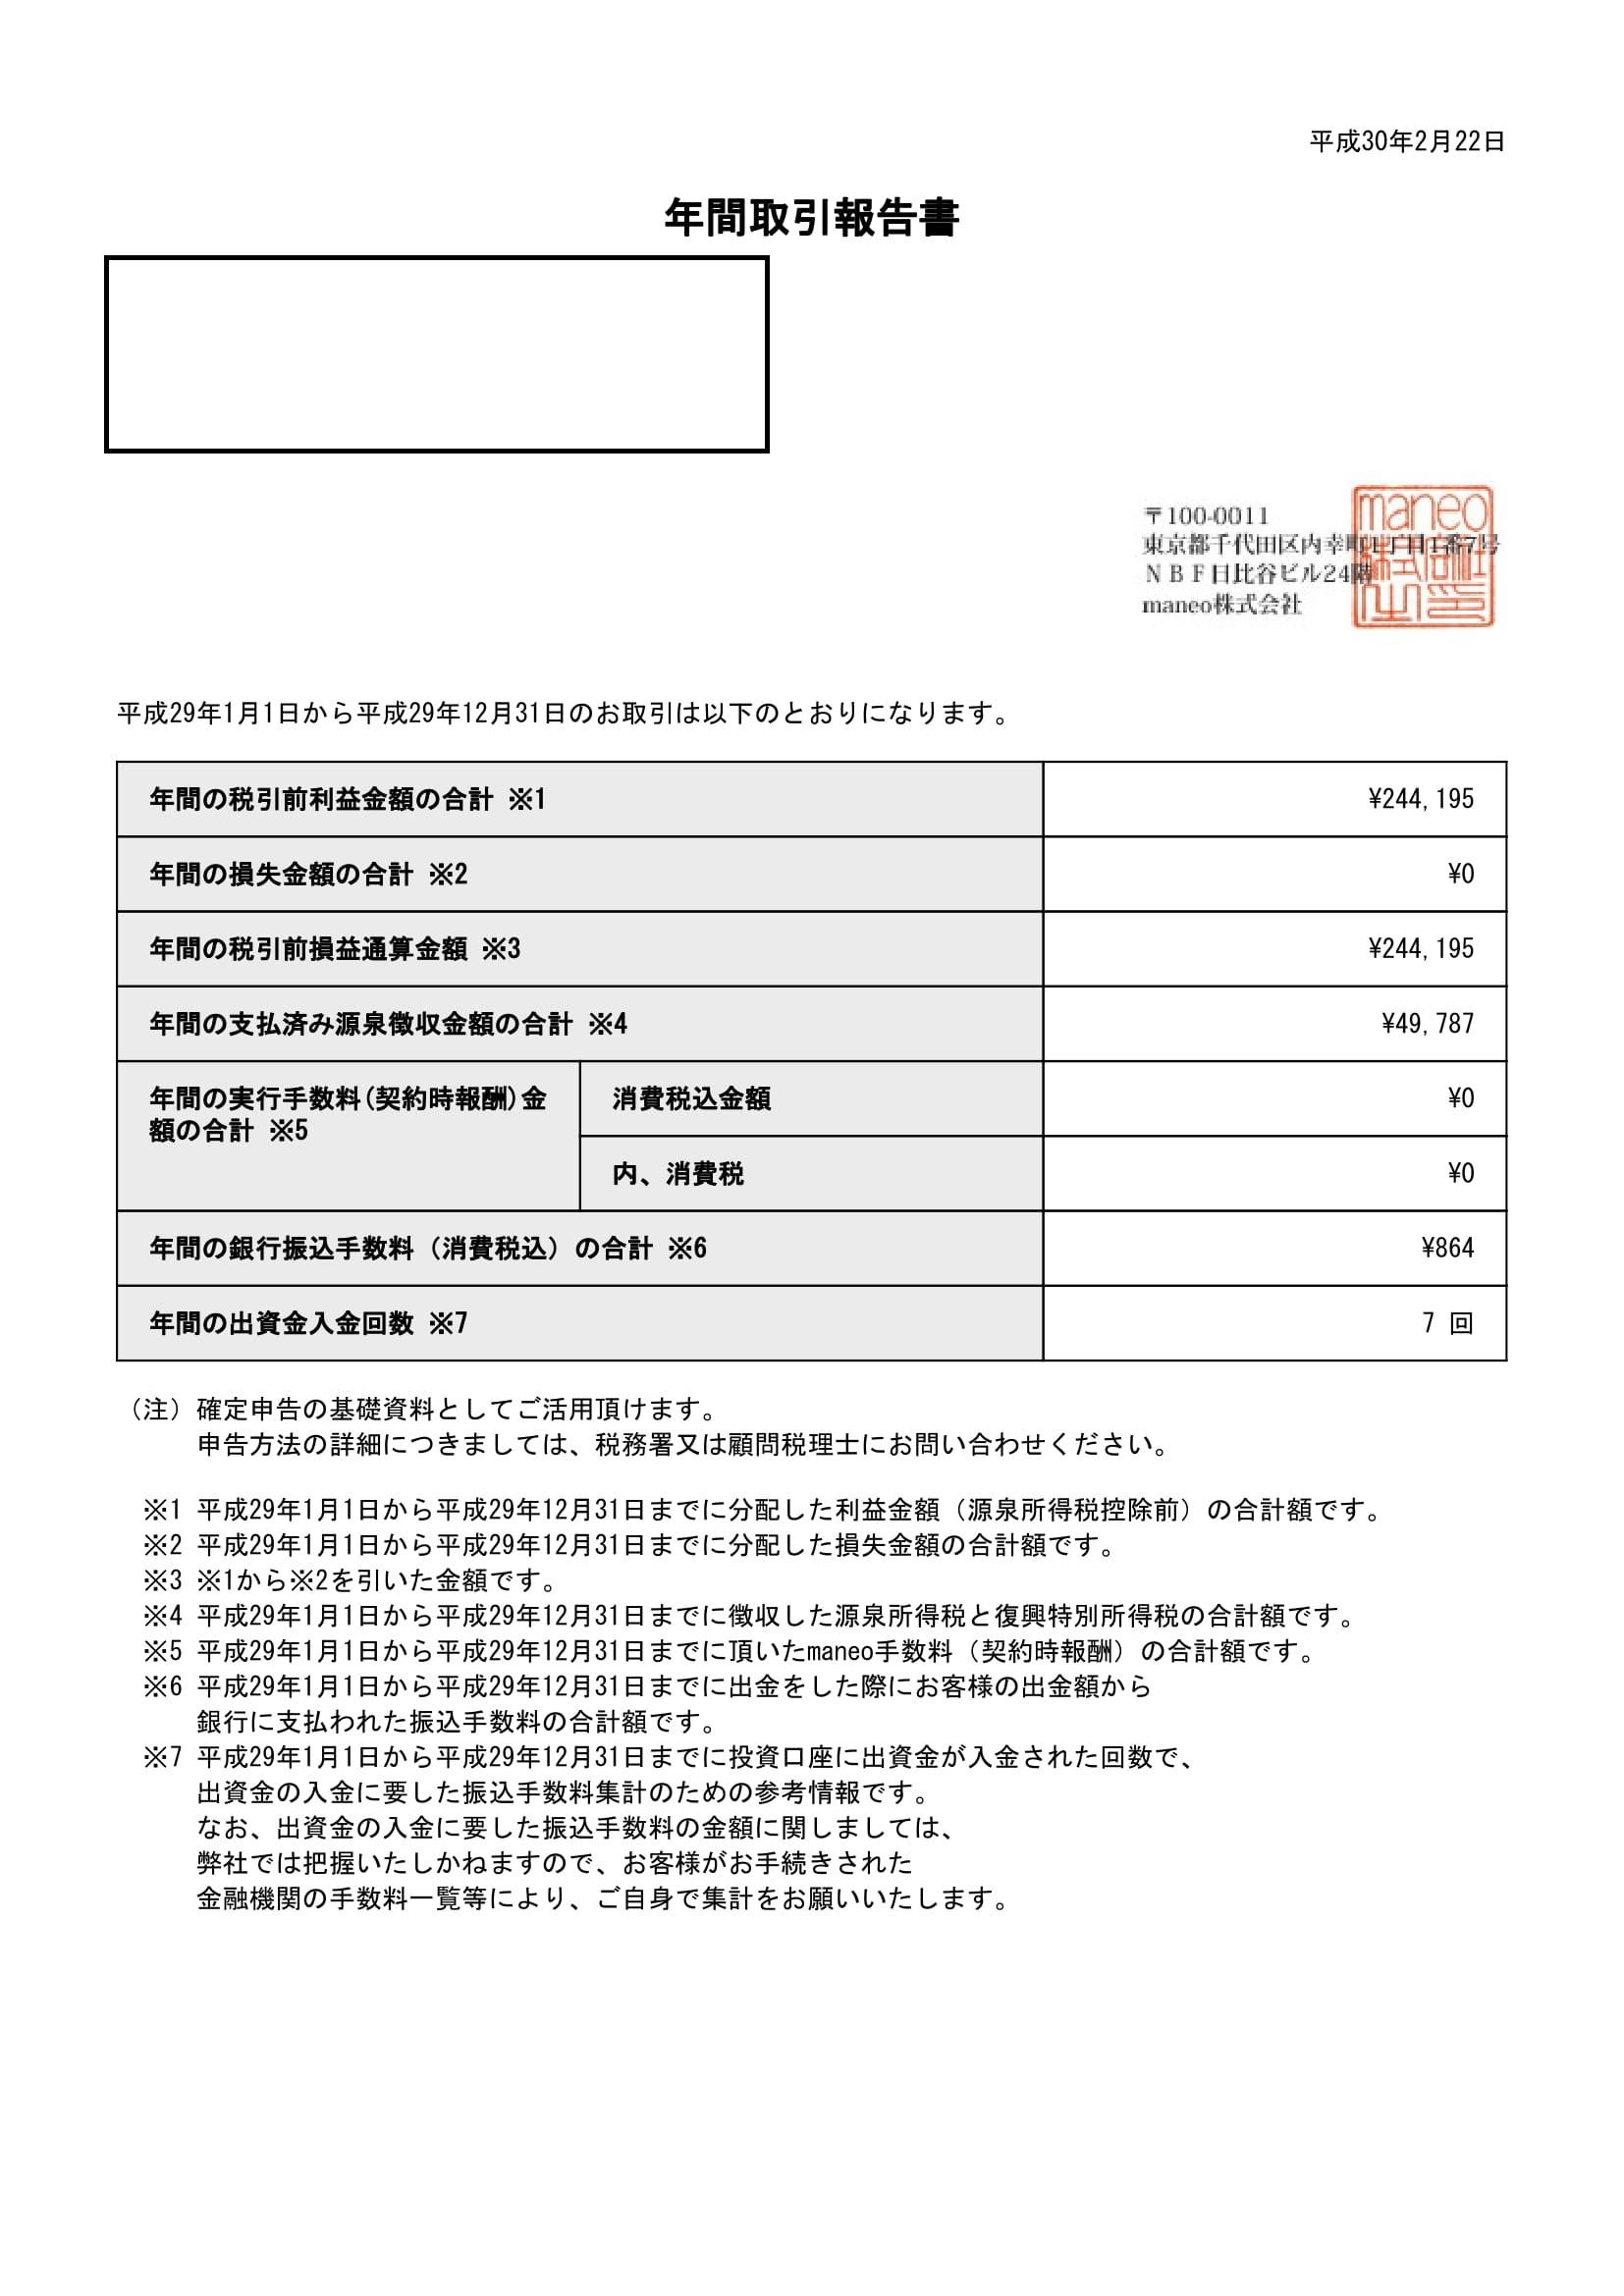 MANEO確定申告データ_23336_20180222-1